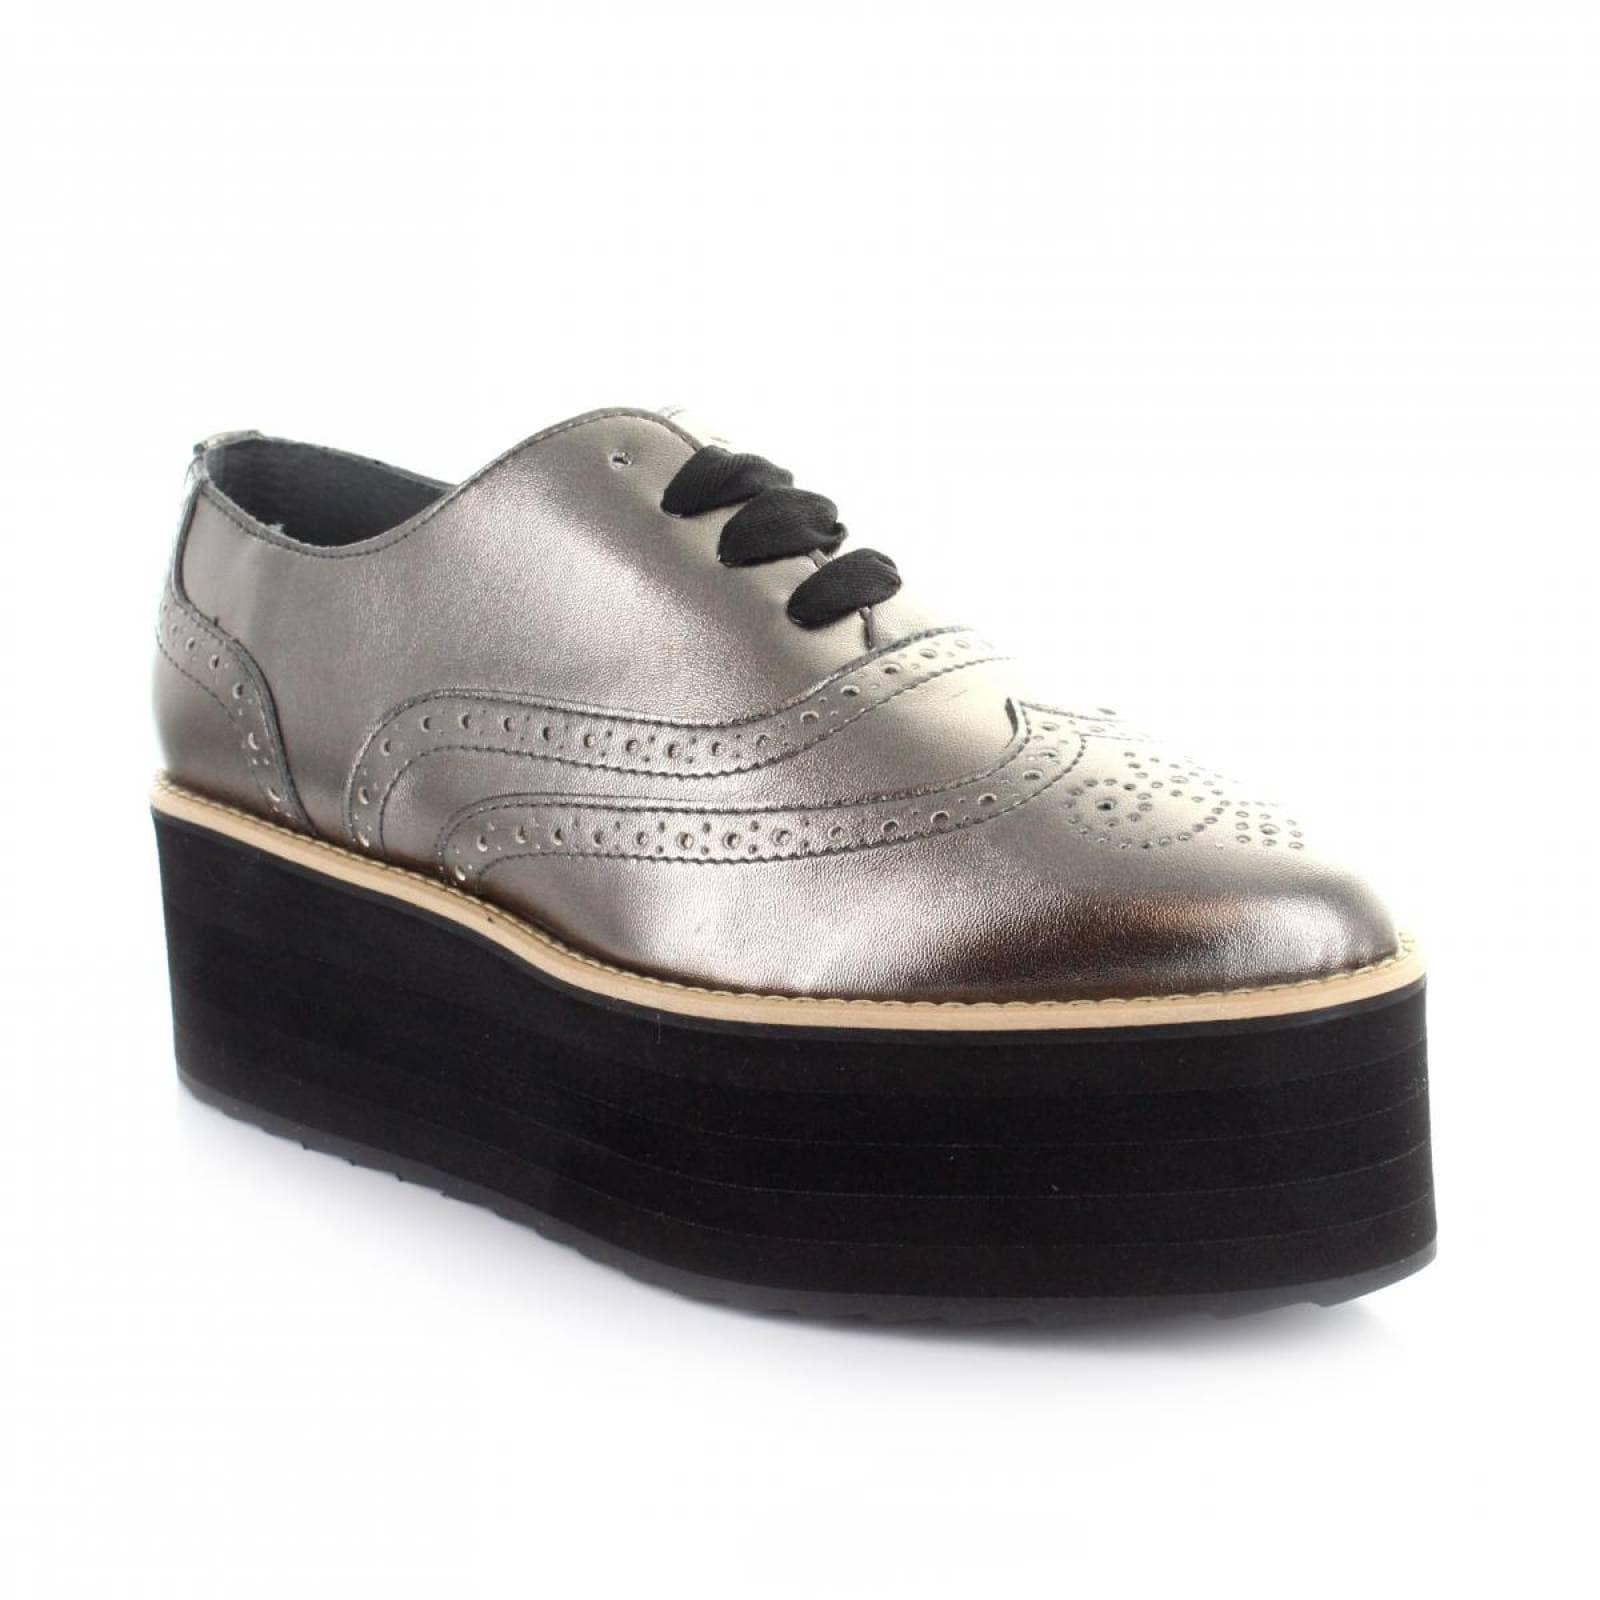 Zapato para Mujer Brantano 9246 049771 Color Inox